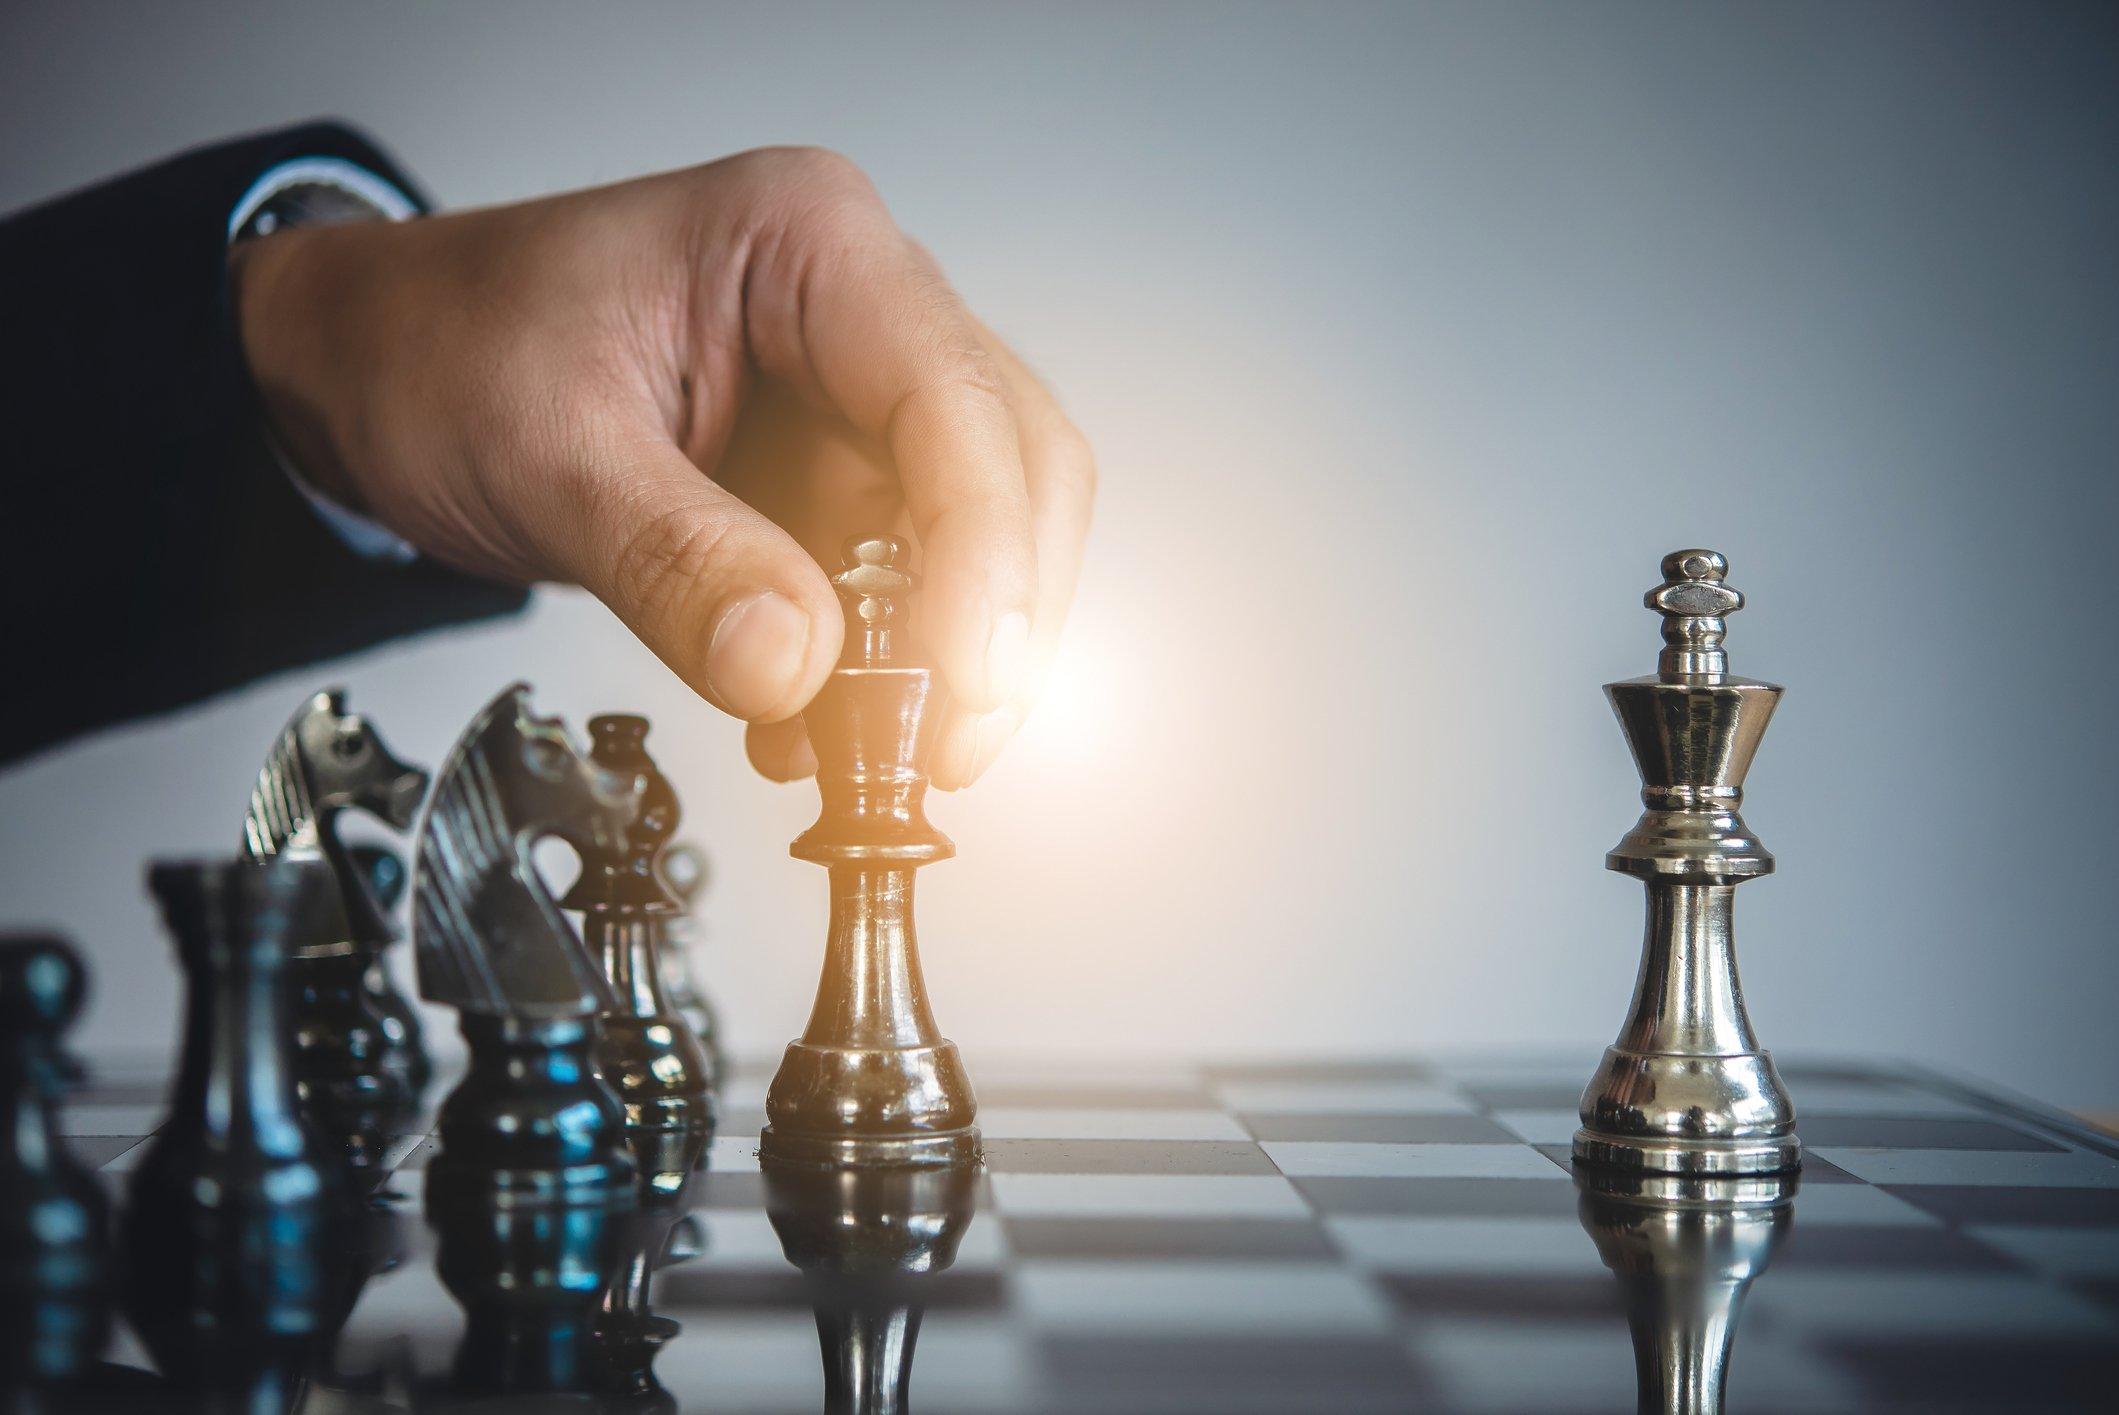 What's Your 401(k) Game Plan? Ethos Capital Advisors